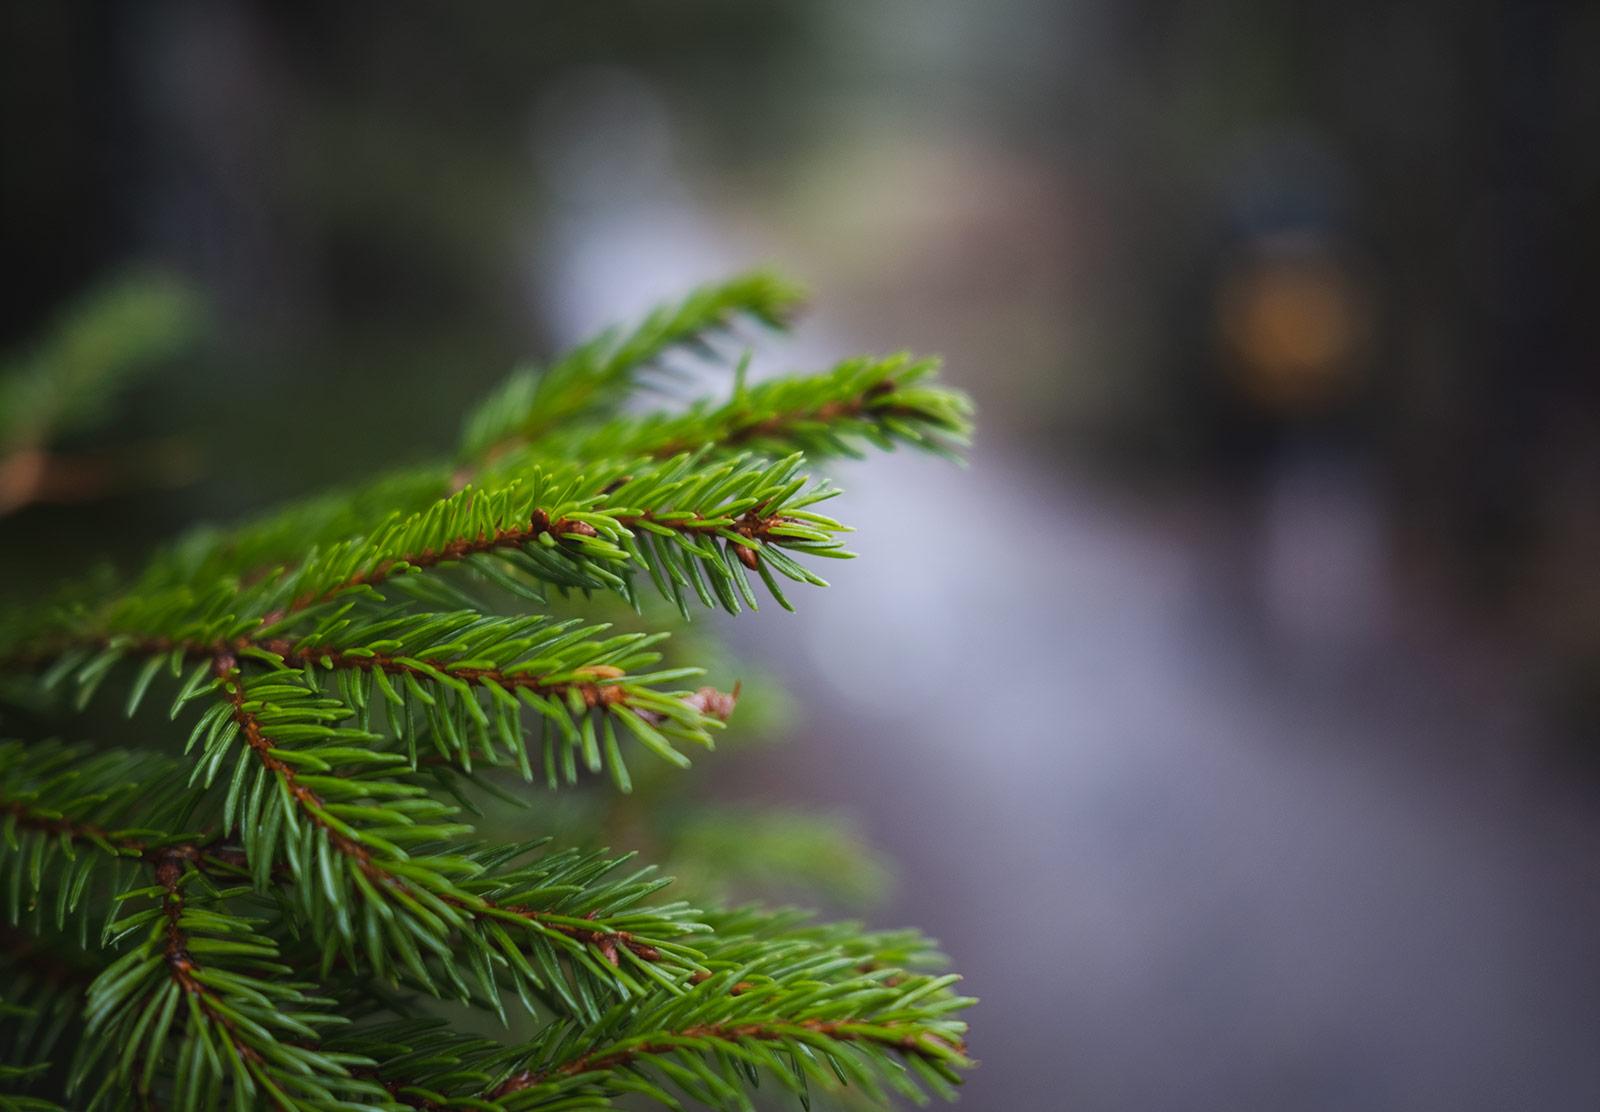 Green spruce needles